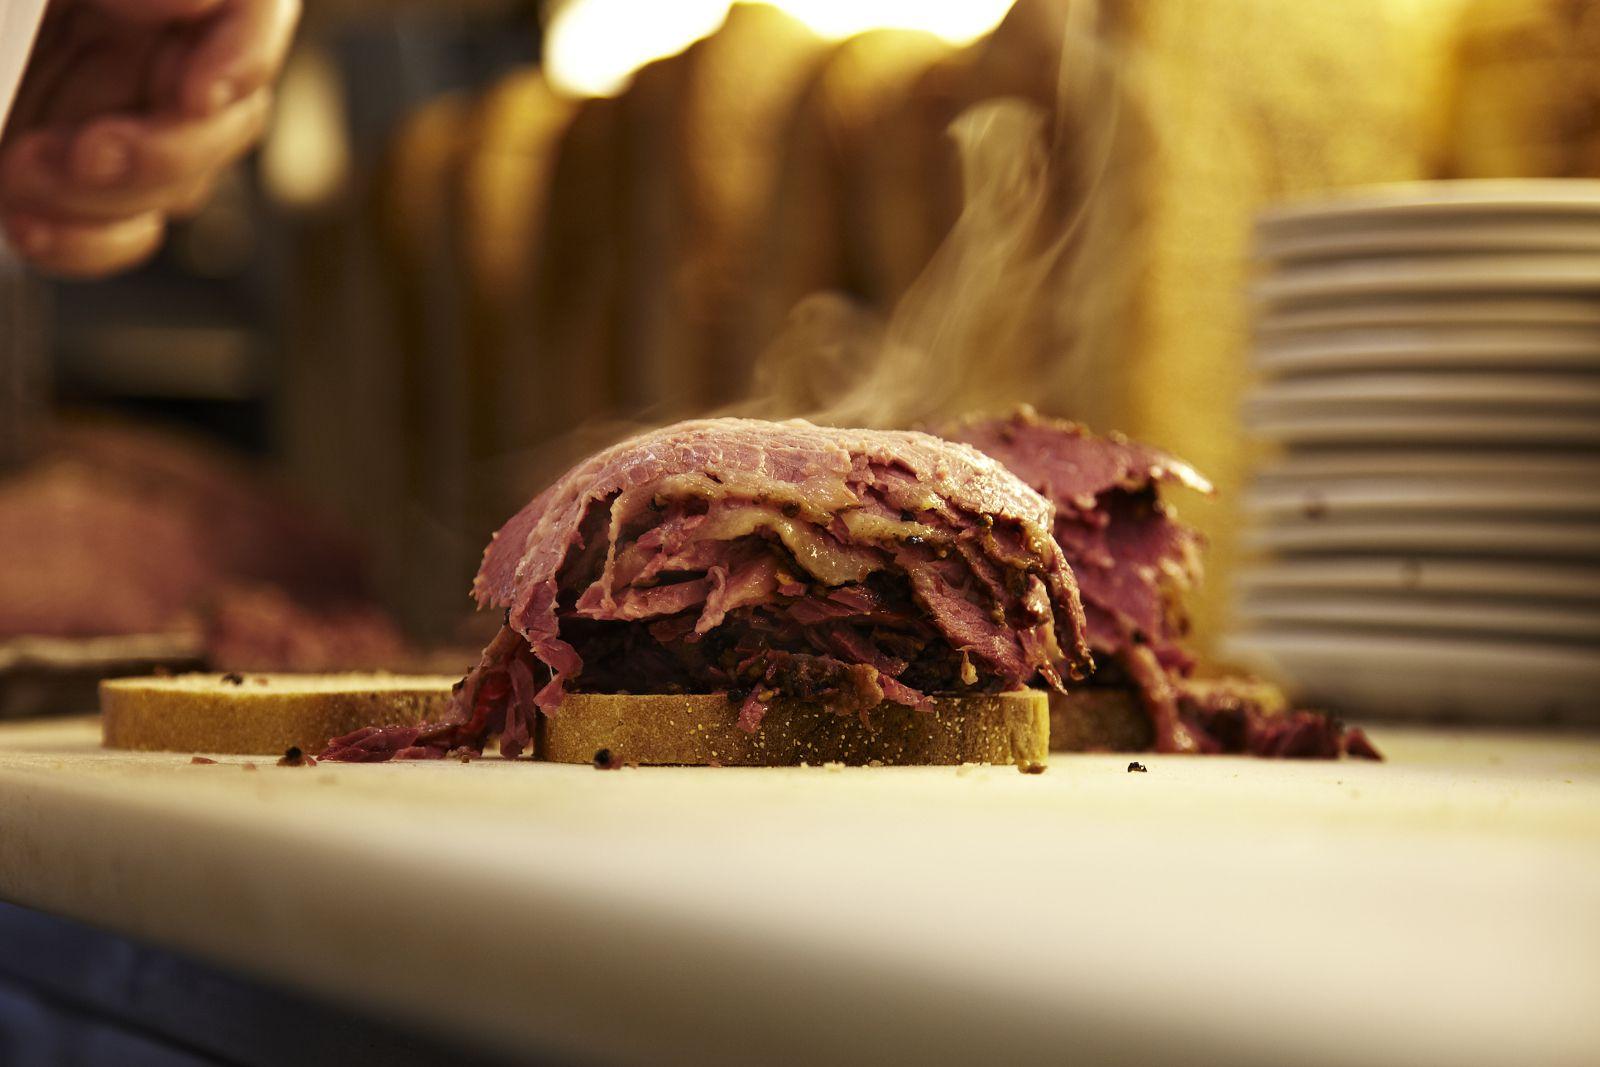 montreal-restaurants-open-christmas-day-schwartzs-finn-o-hara-getty-565b922a5f9b5835e46e7fbf.jpg